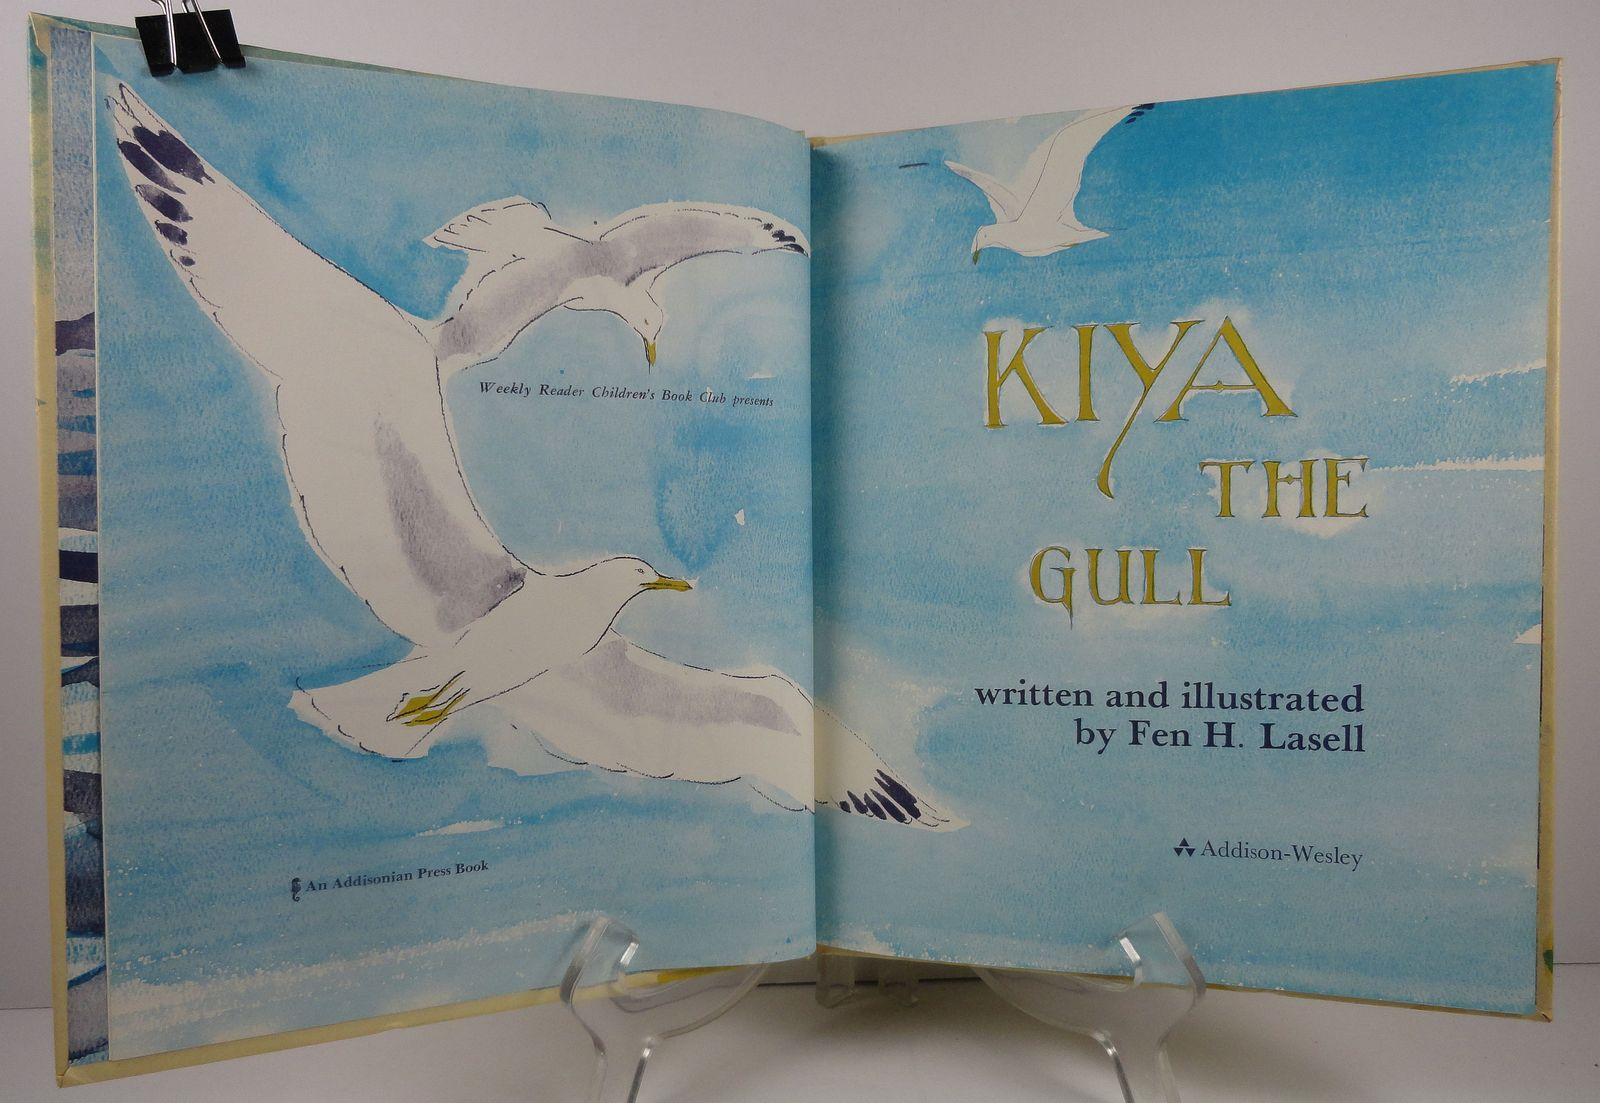 Kiya the Gull by Fen H. Lasell 1969 Weekly Reader